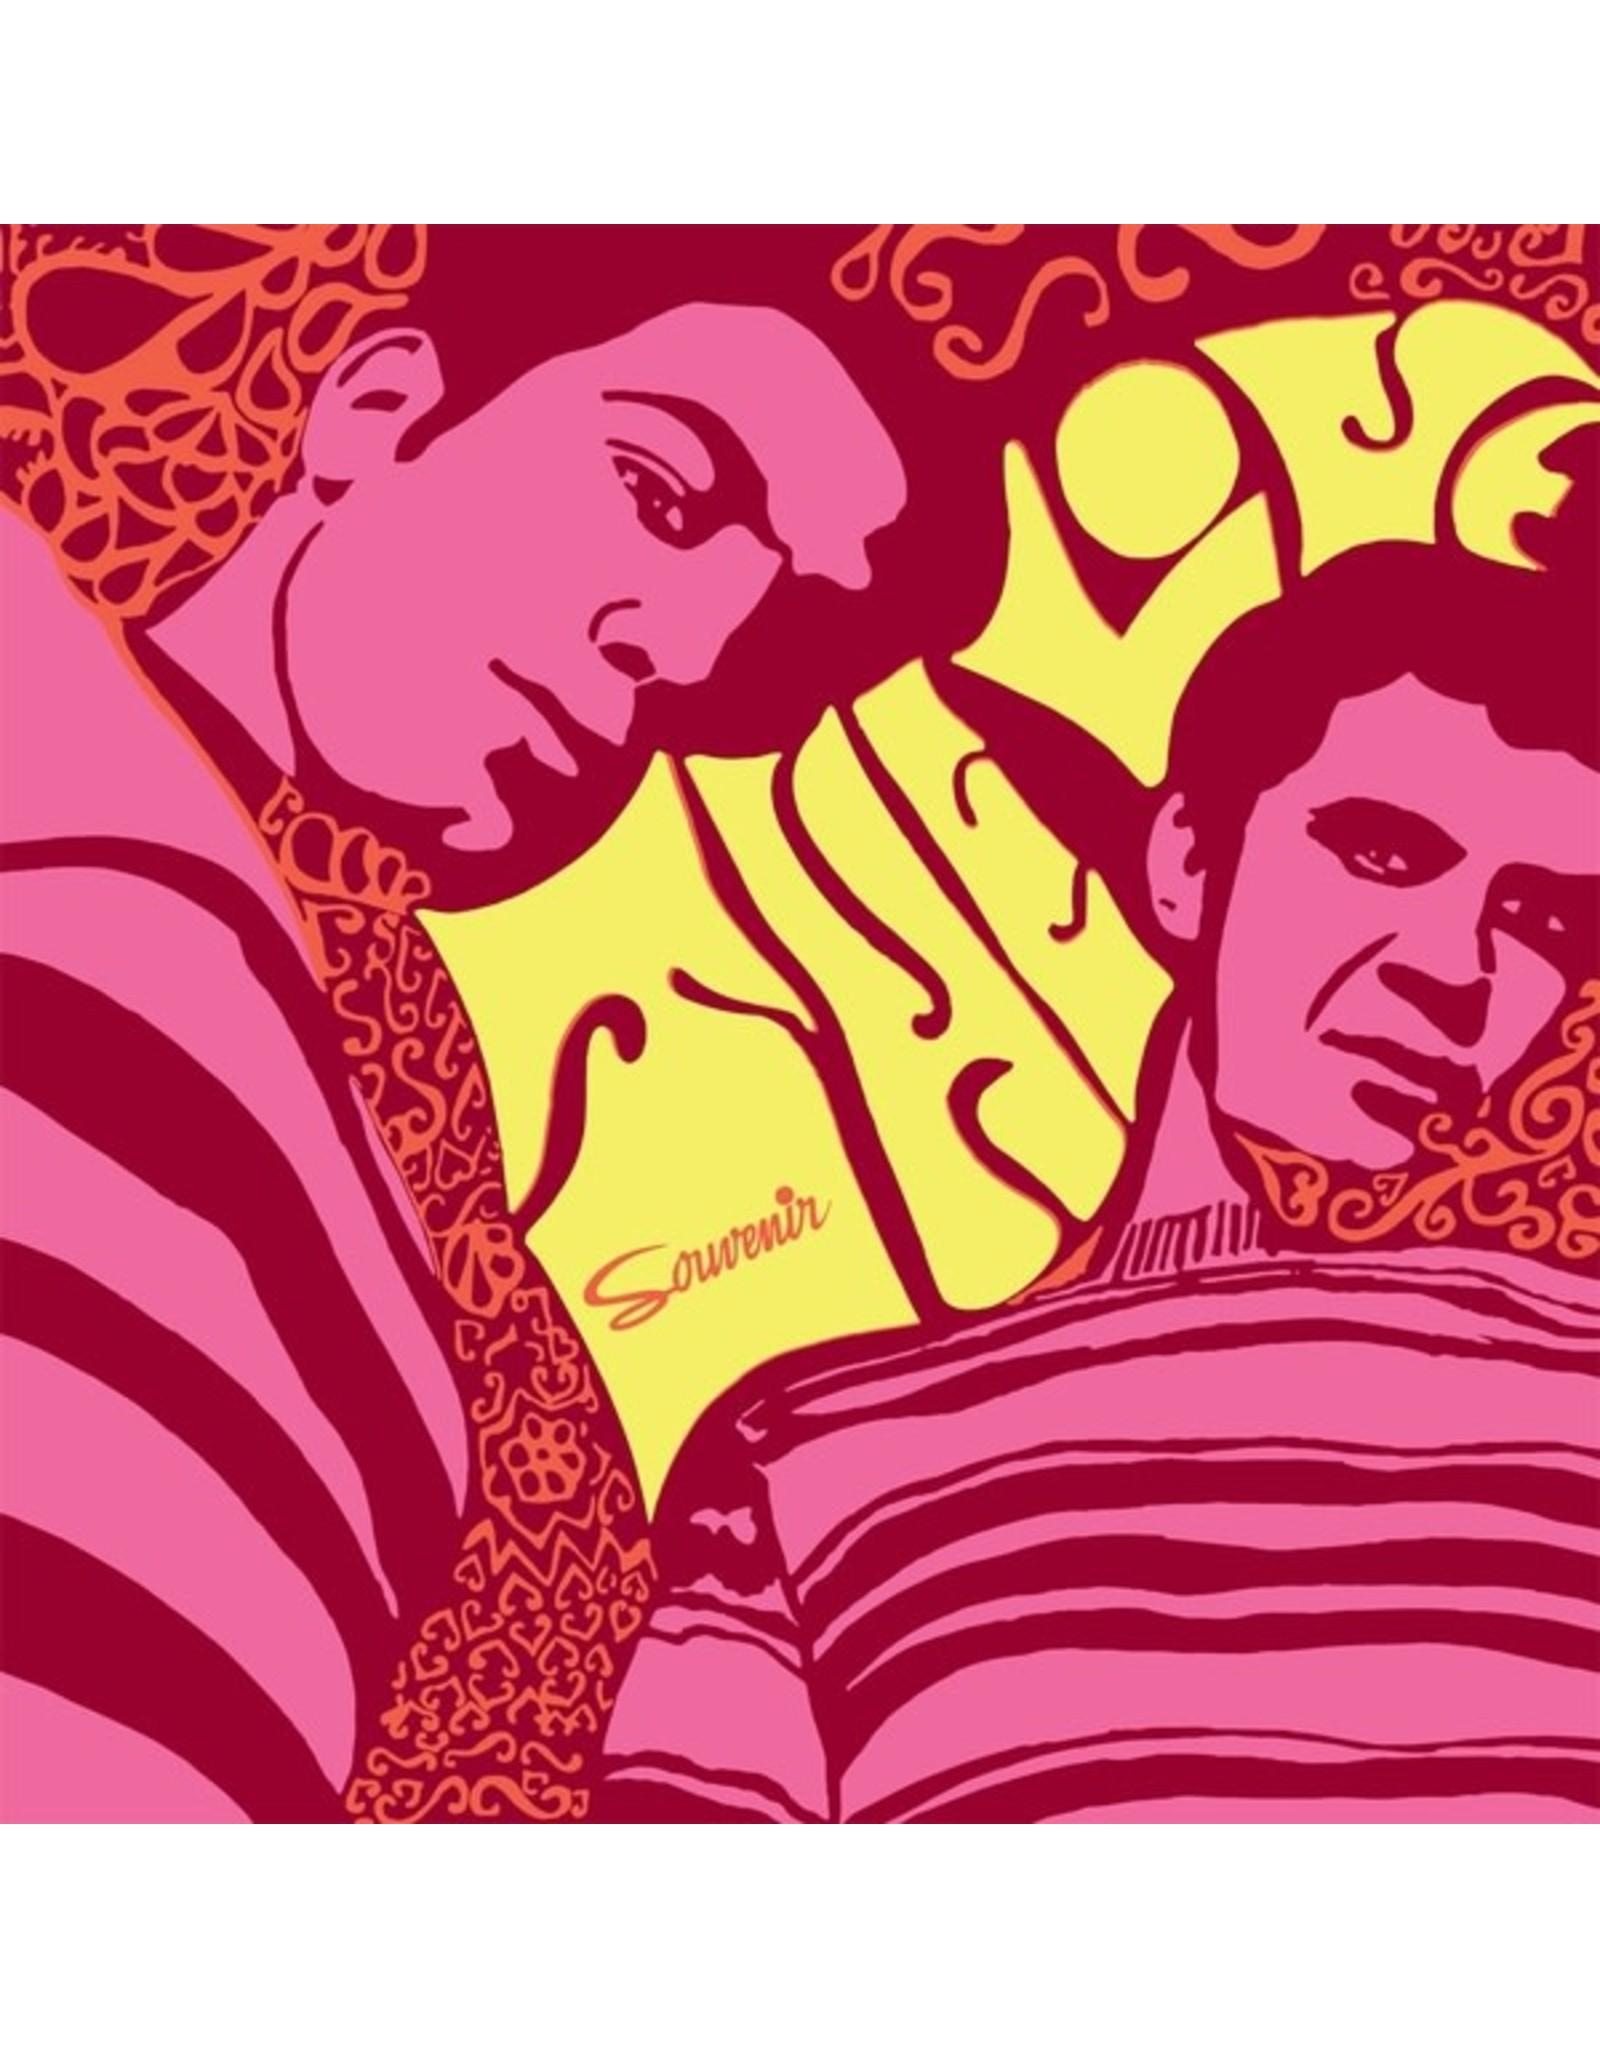 New Vinyl The Love Depression - S/T LP